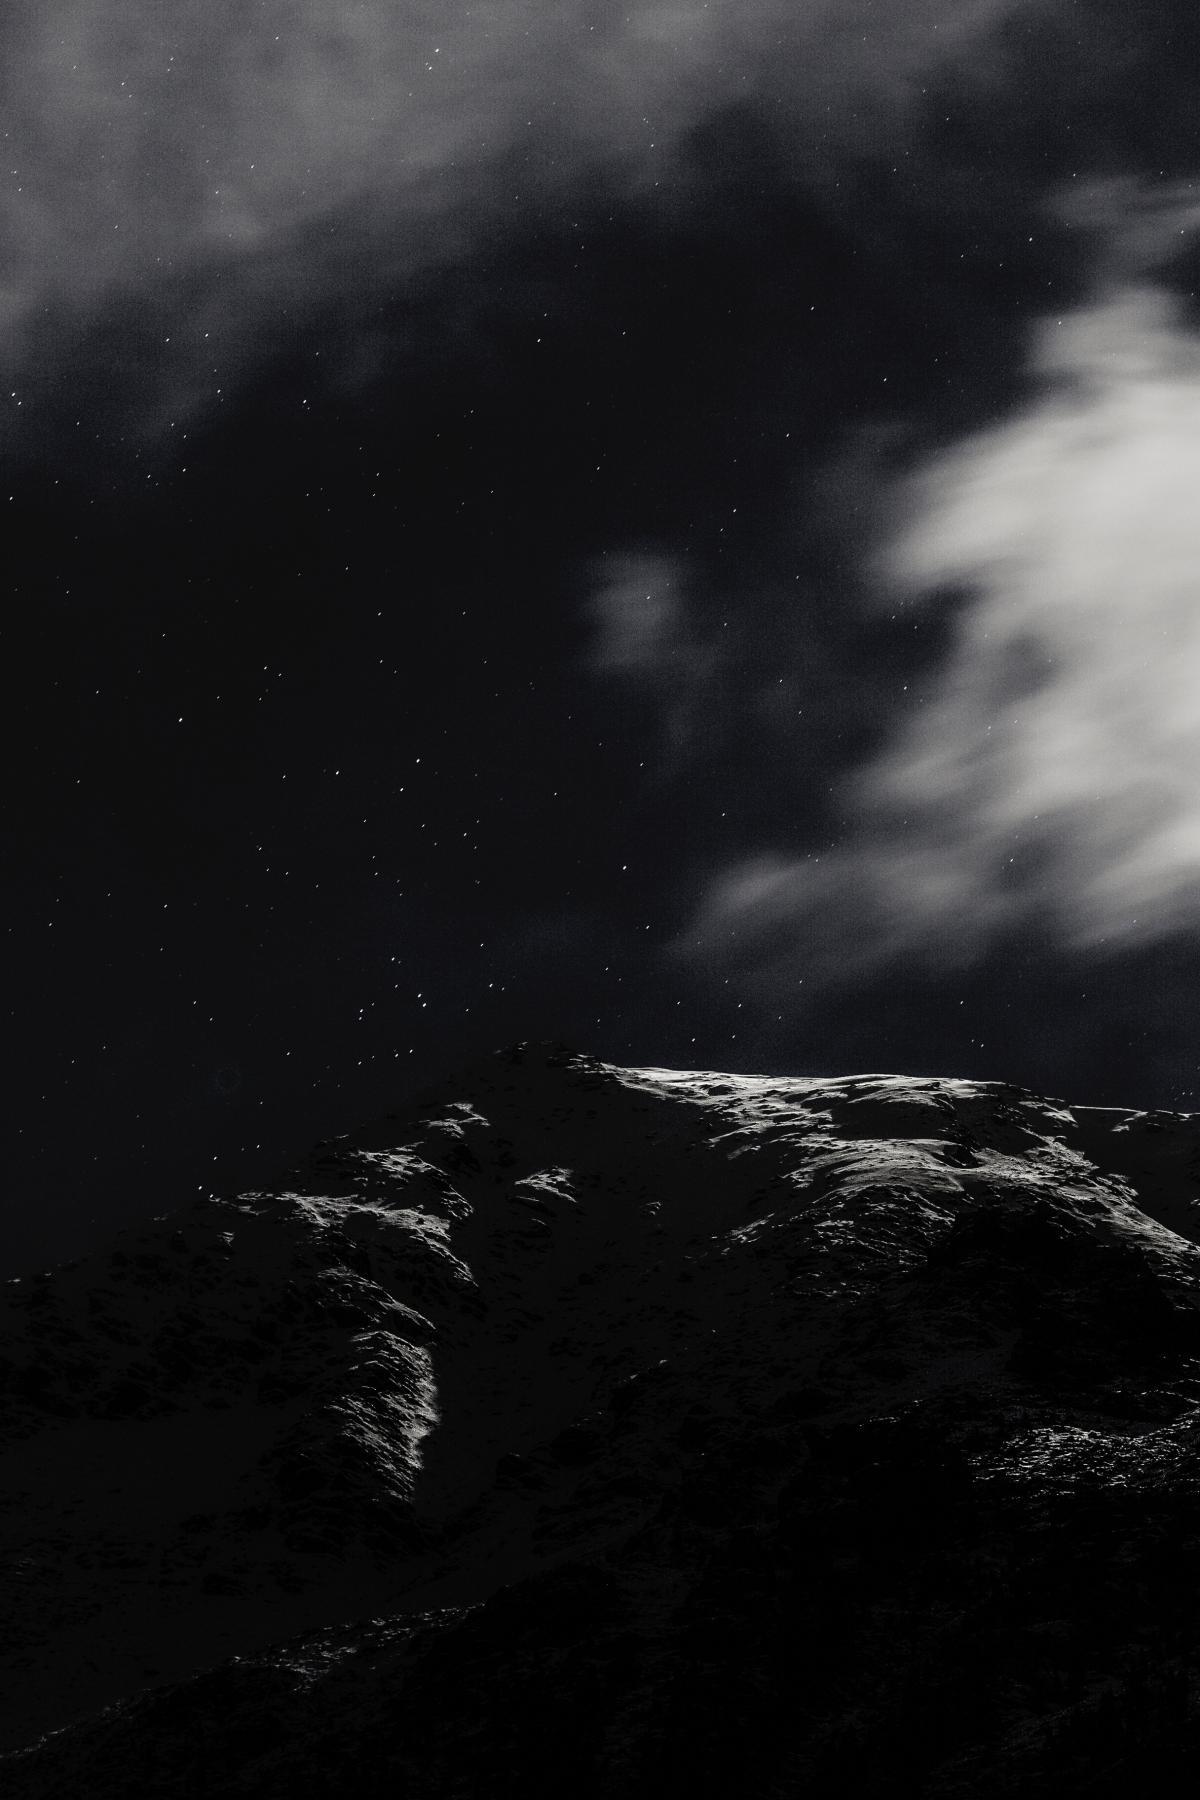 Star Celestial body Moon